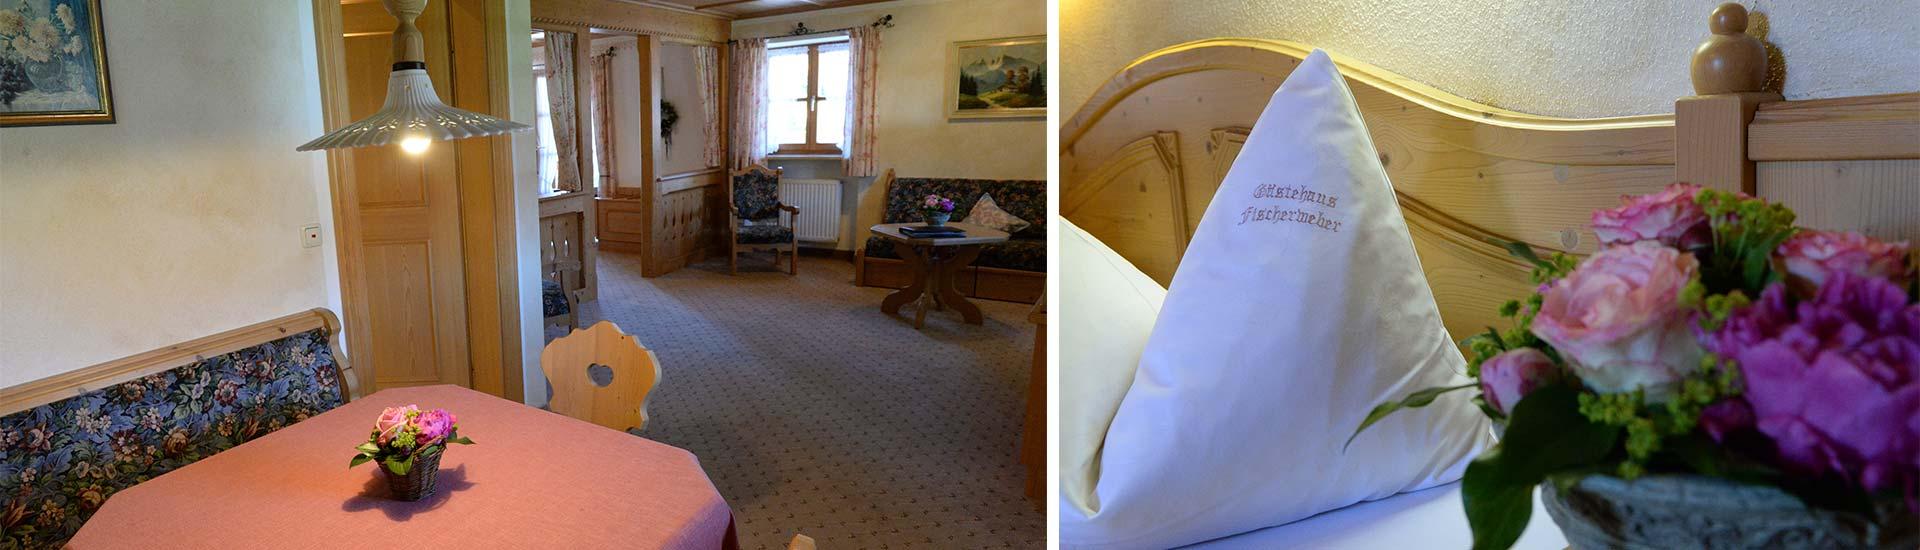 appartement-25-tegernsee